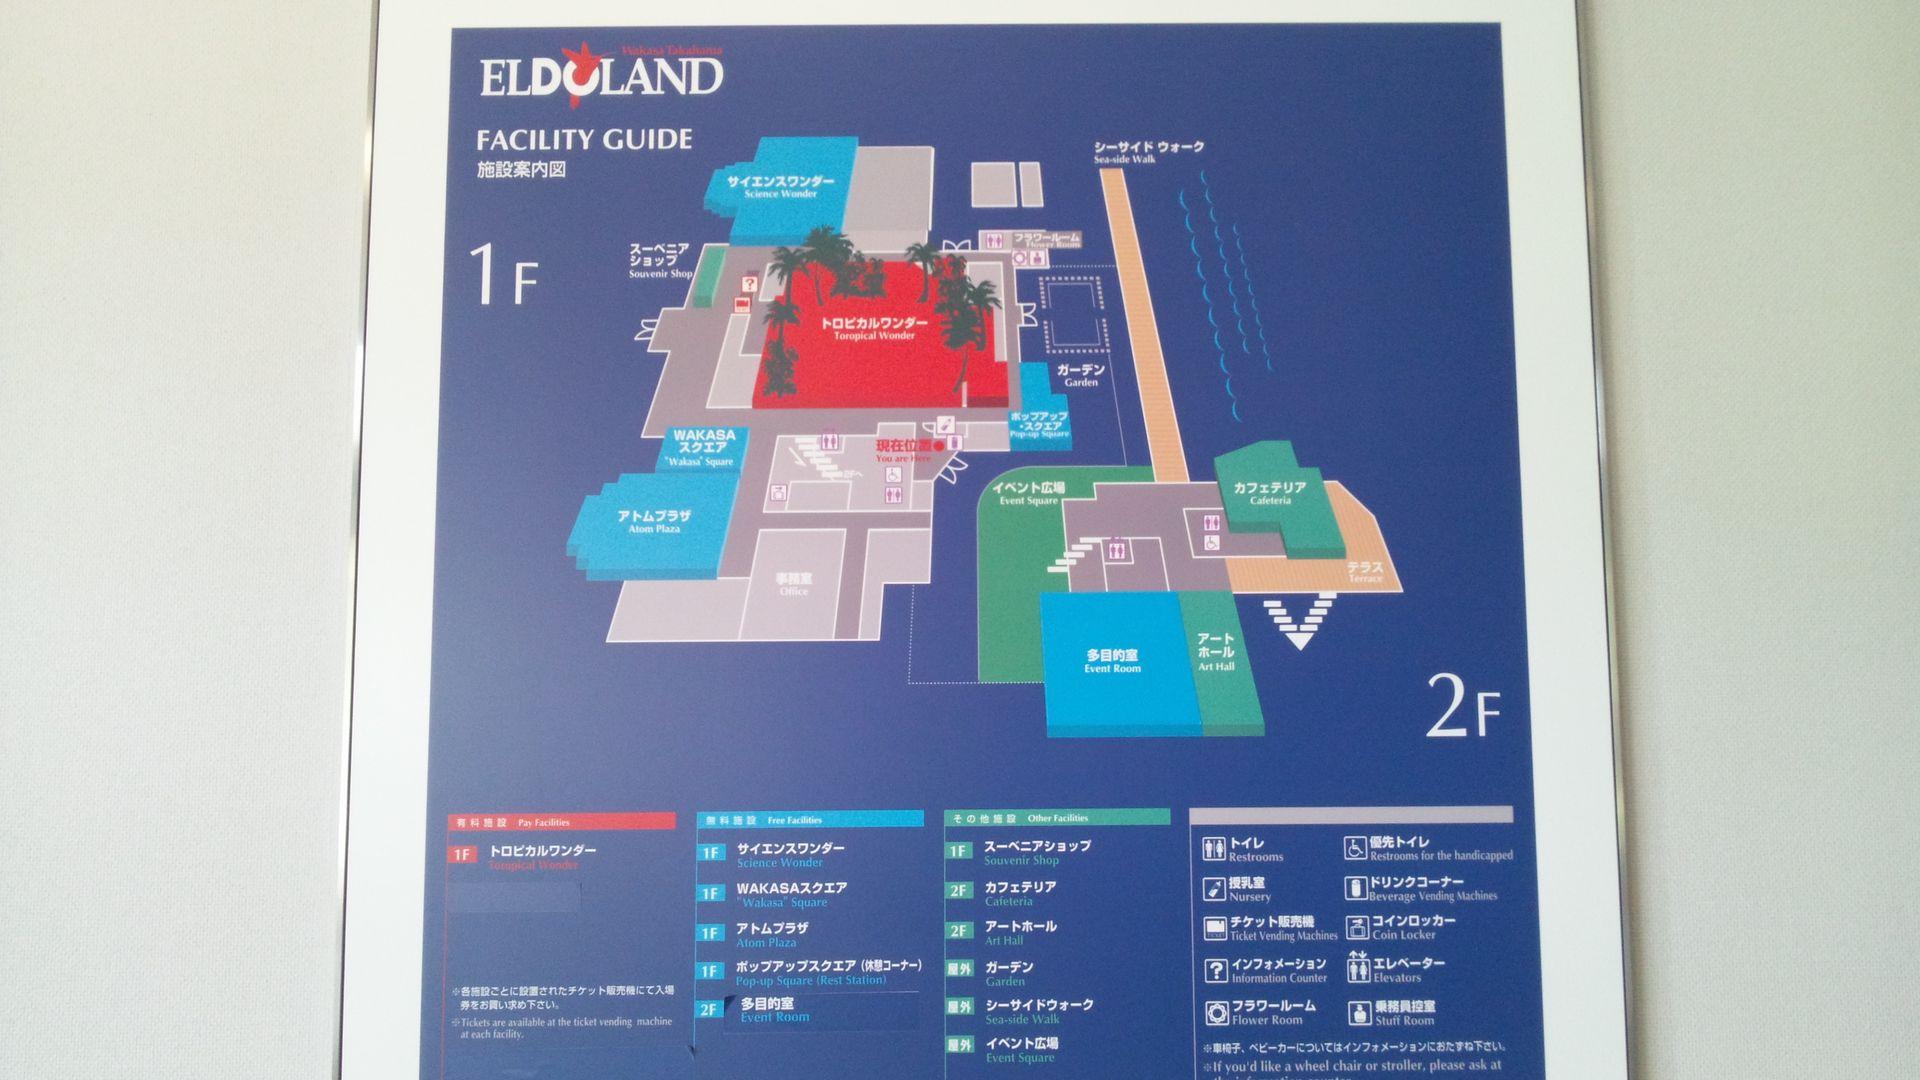 eldoland02.jpg